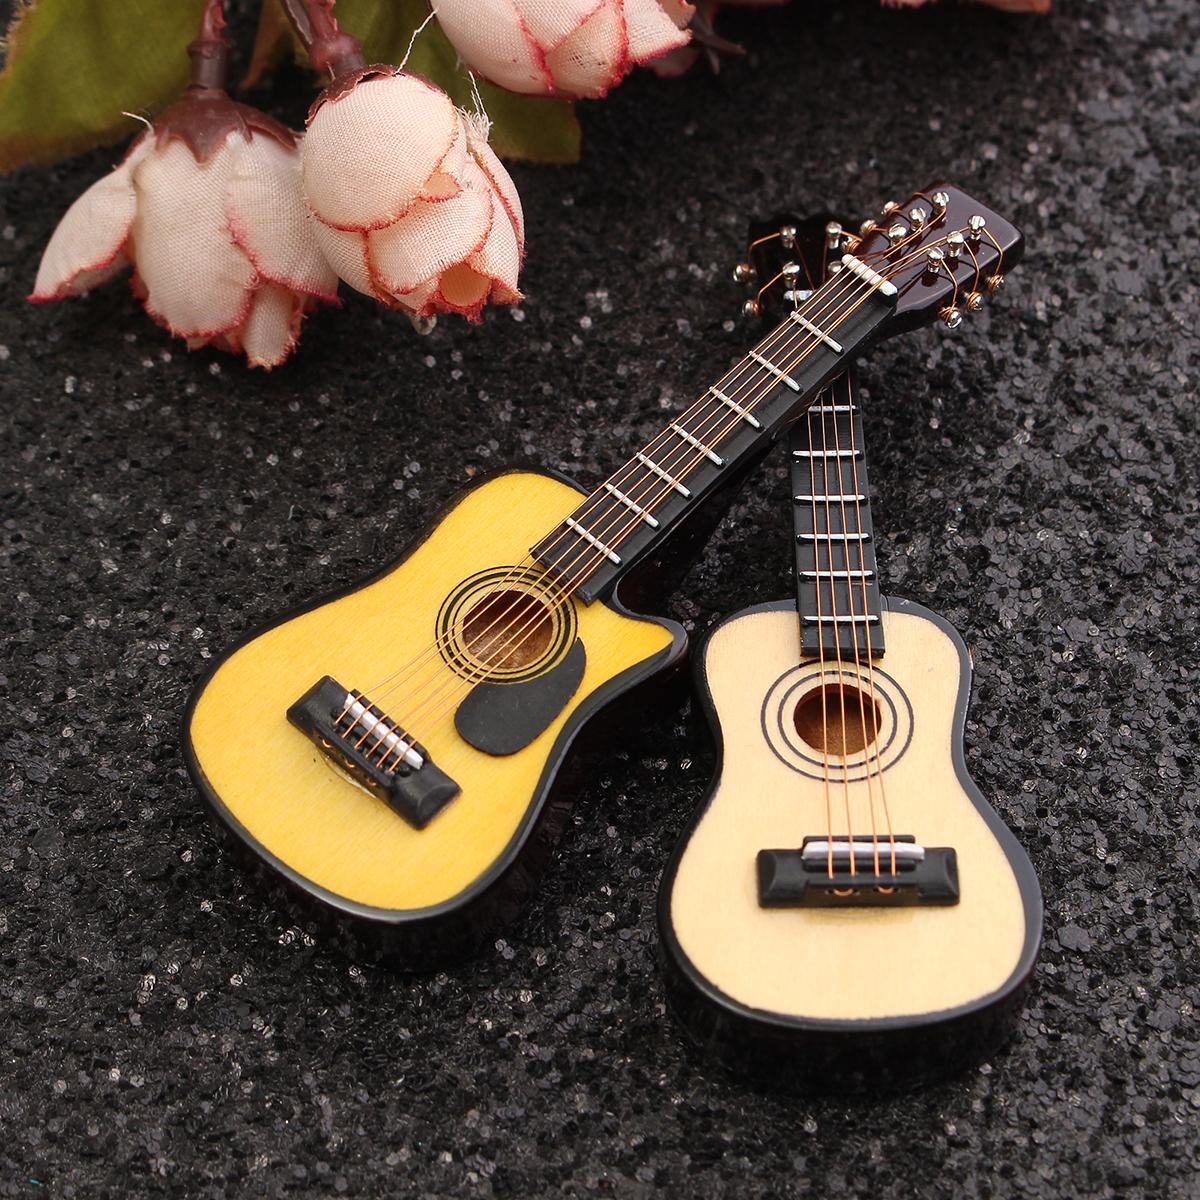 1/12 Scale Dollhouse Miniature Guitar Accessories Instrument DIY Part For Dollhouse